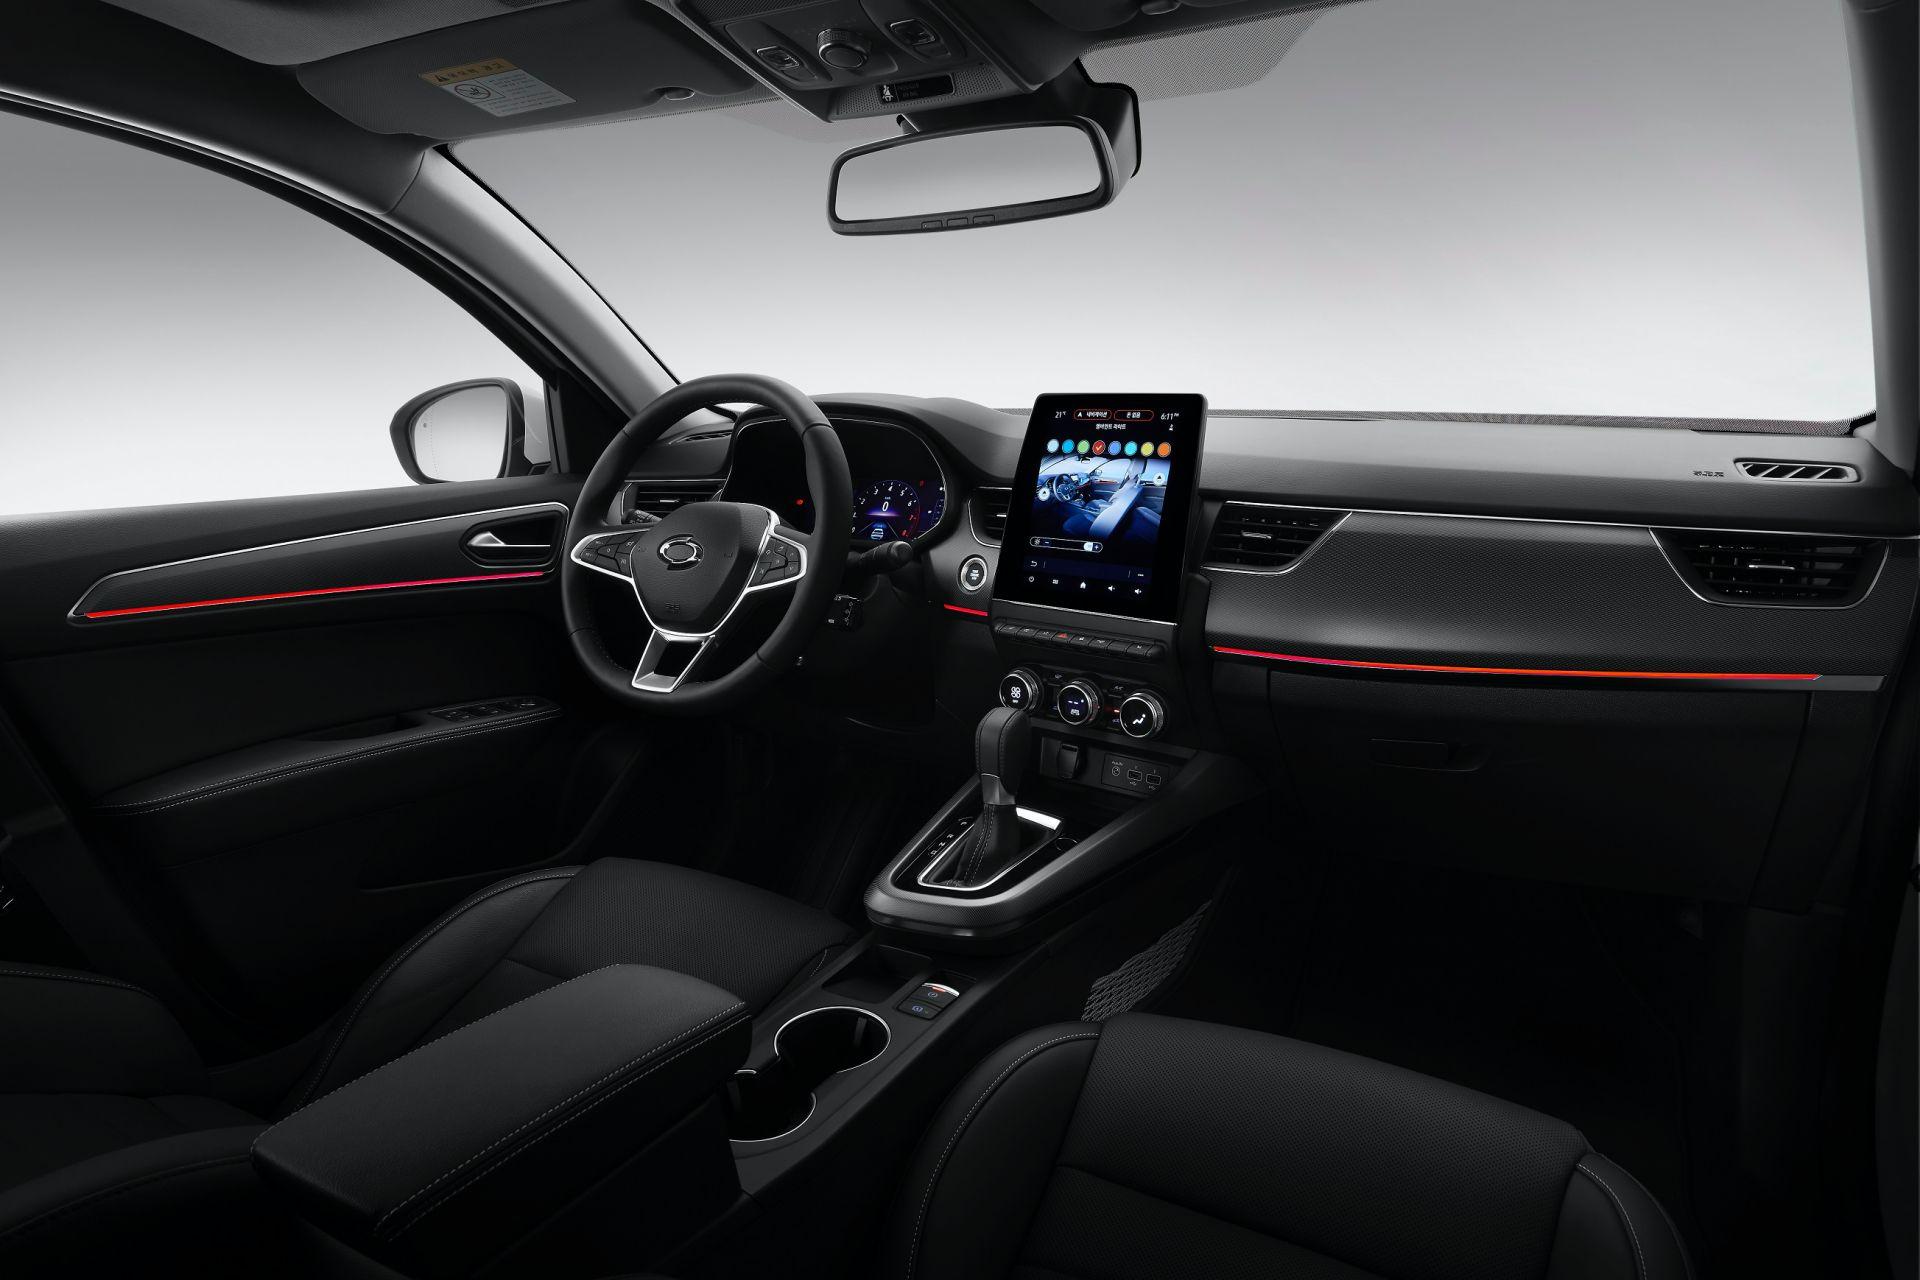 Renault_Samsung_XM3_0013